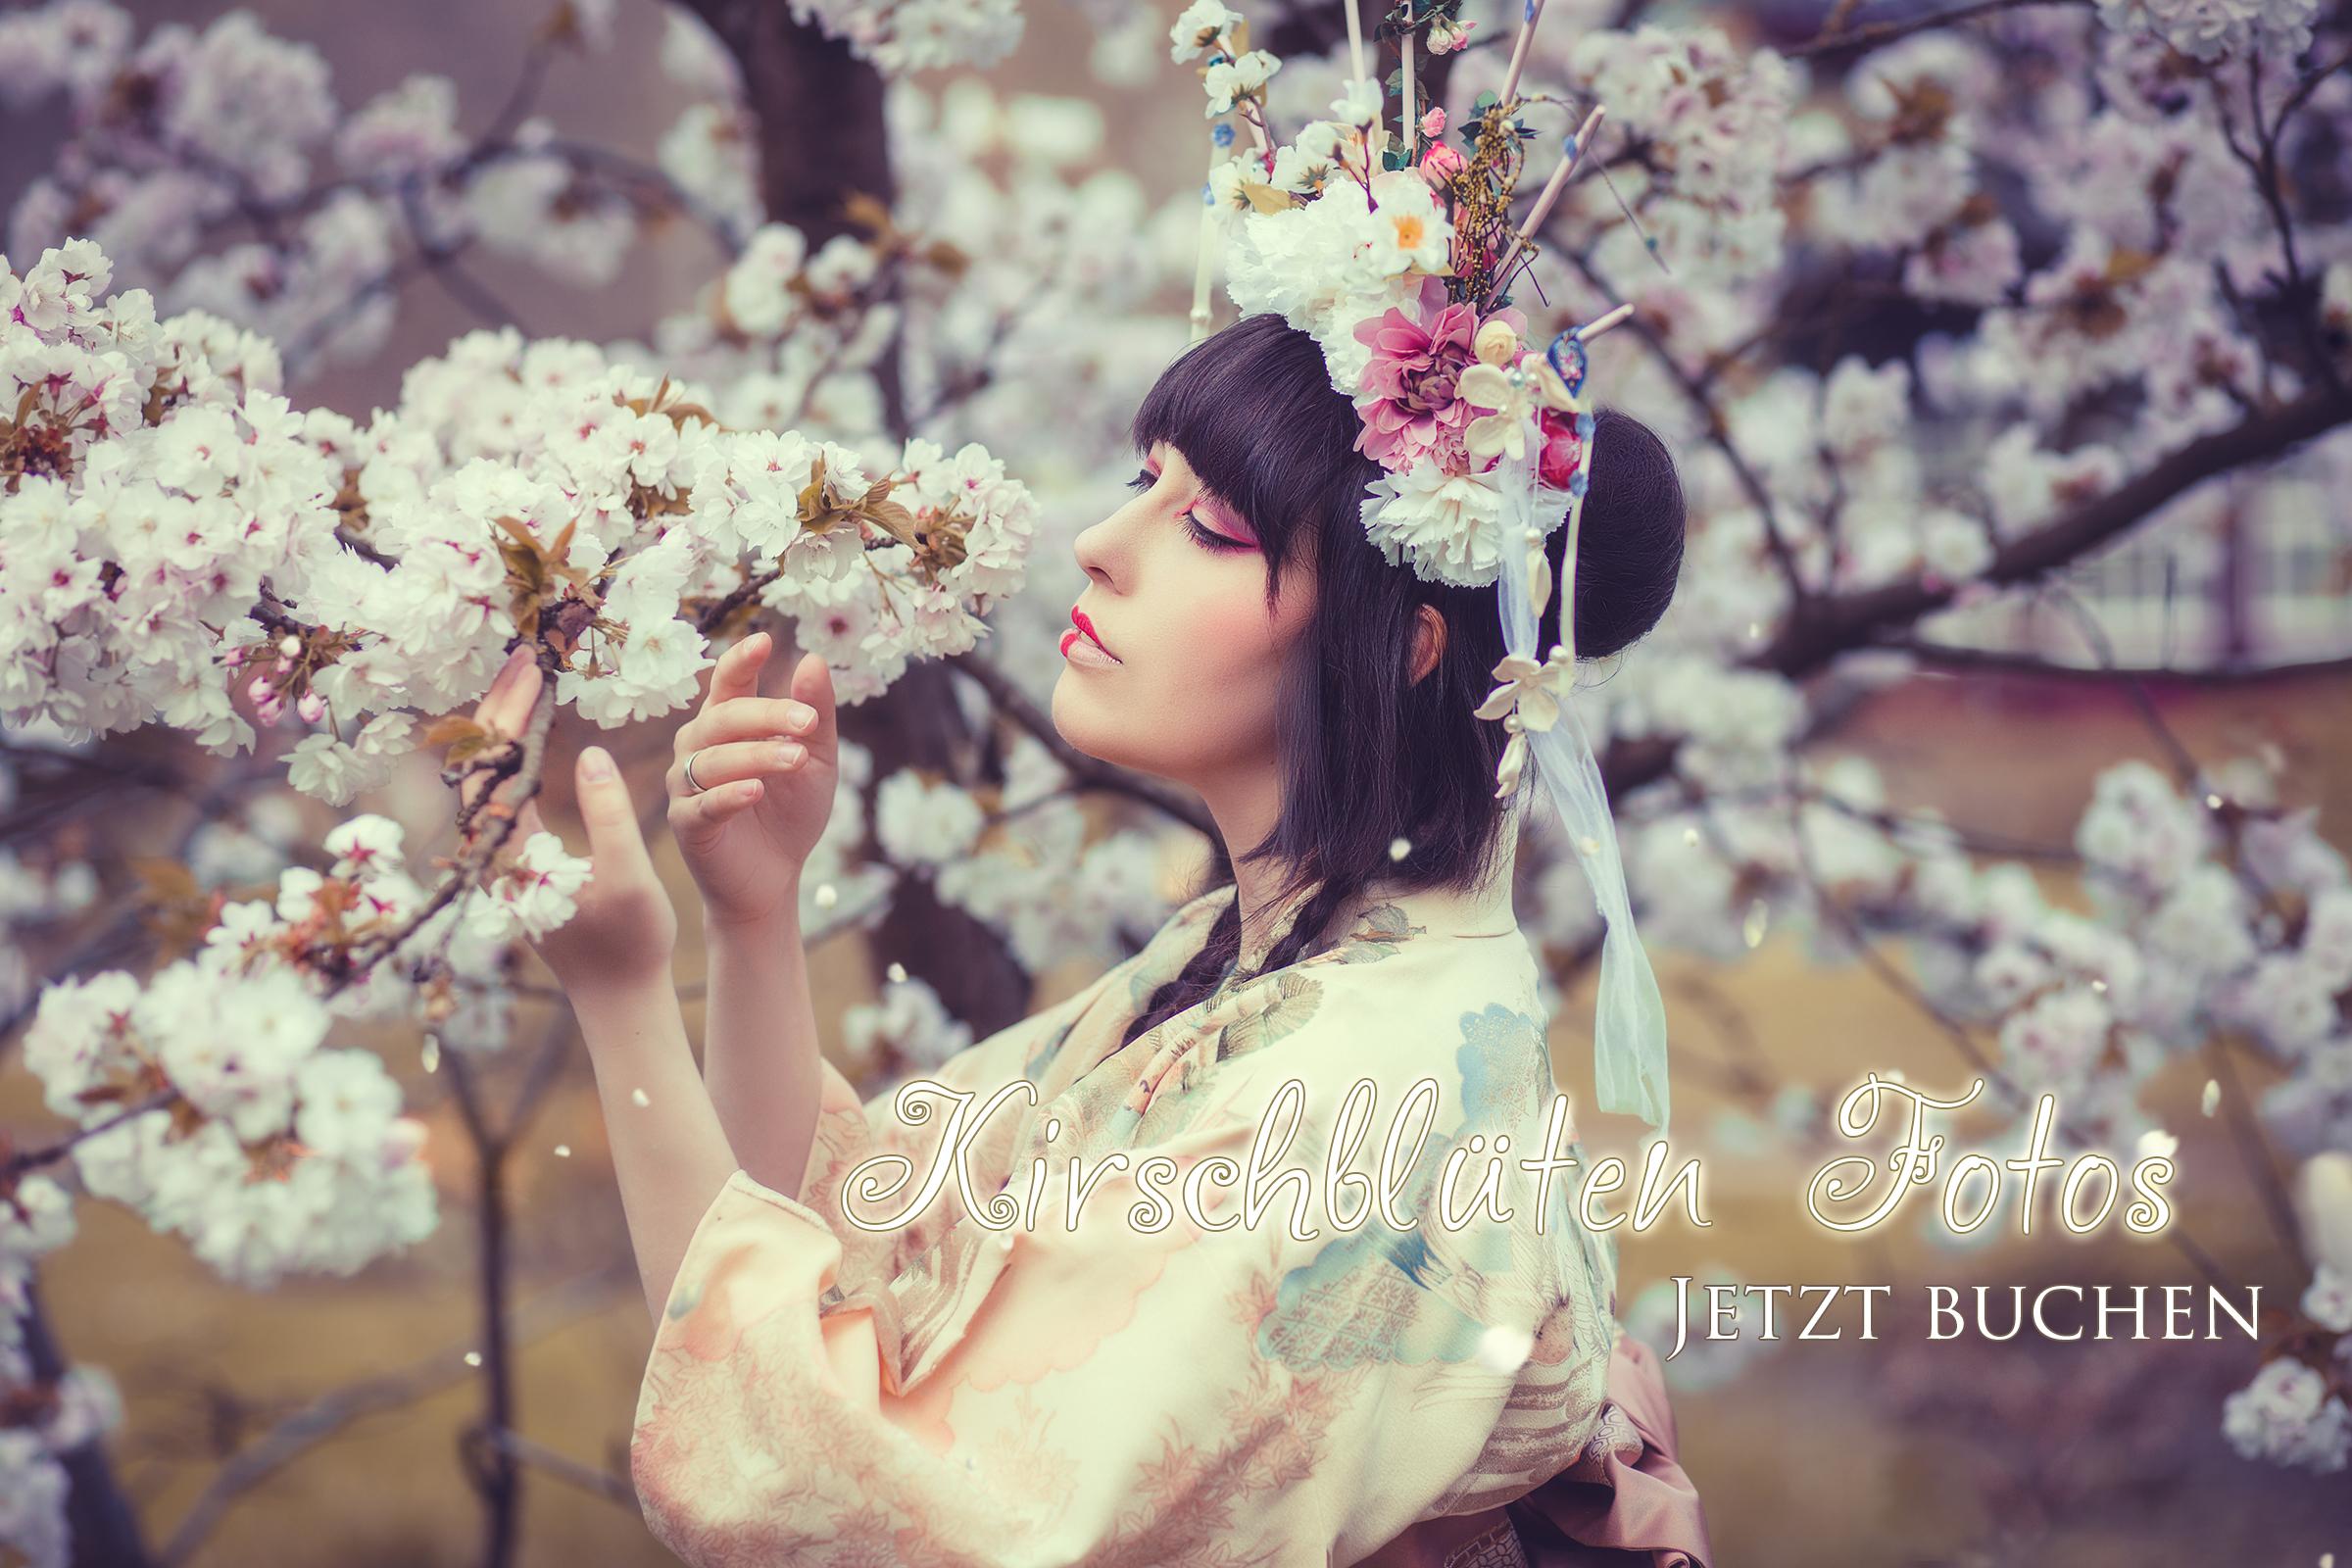 Sylvana-geisha-1-banner